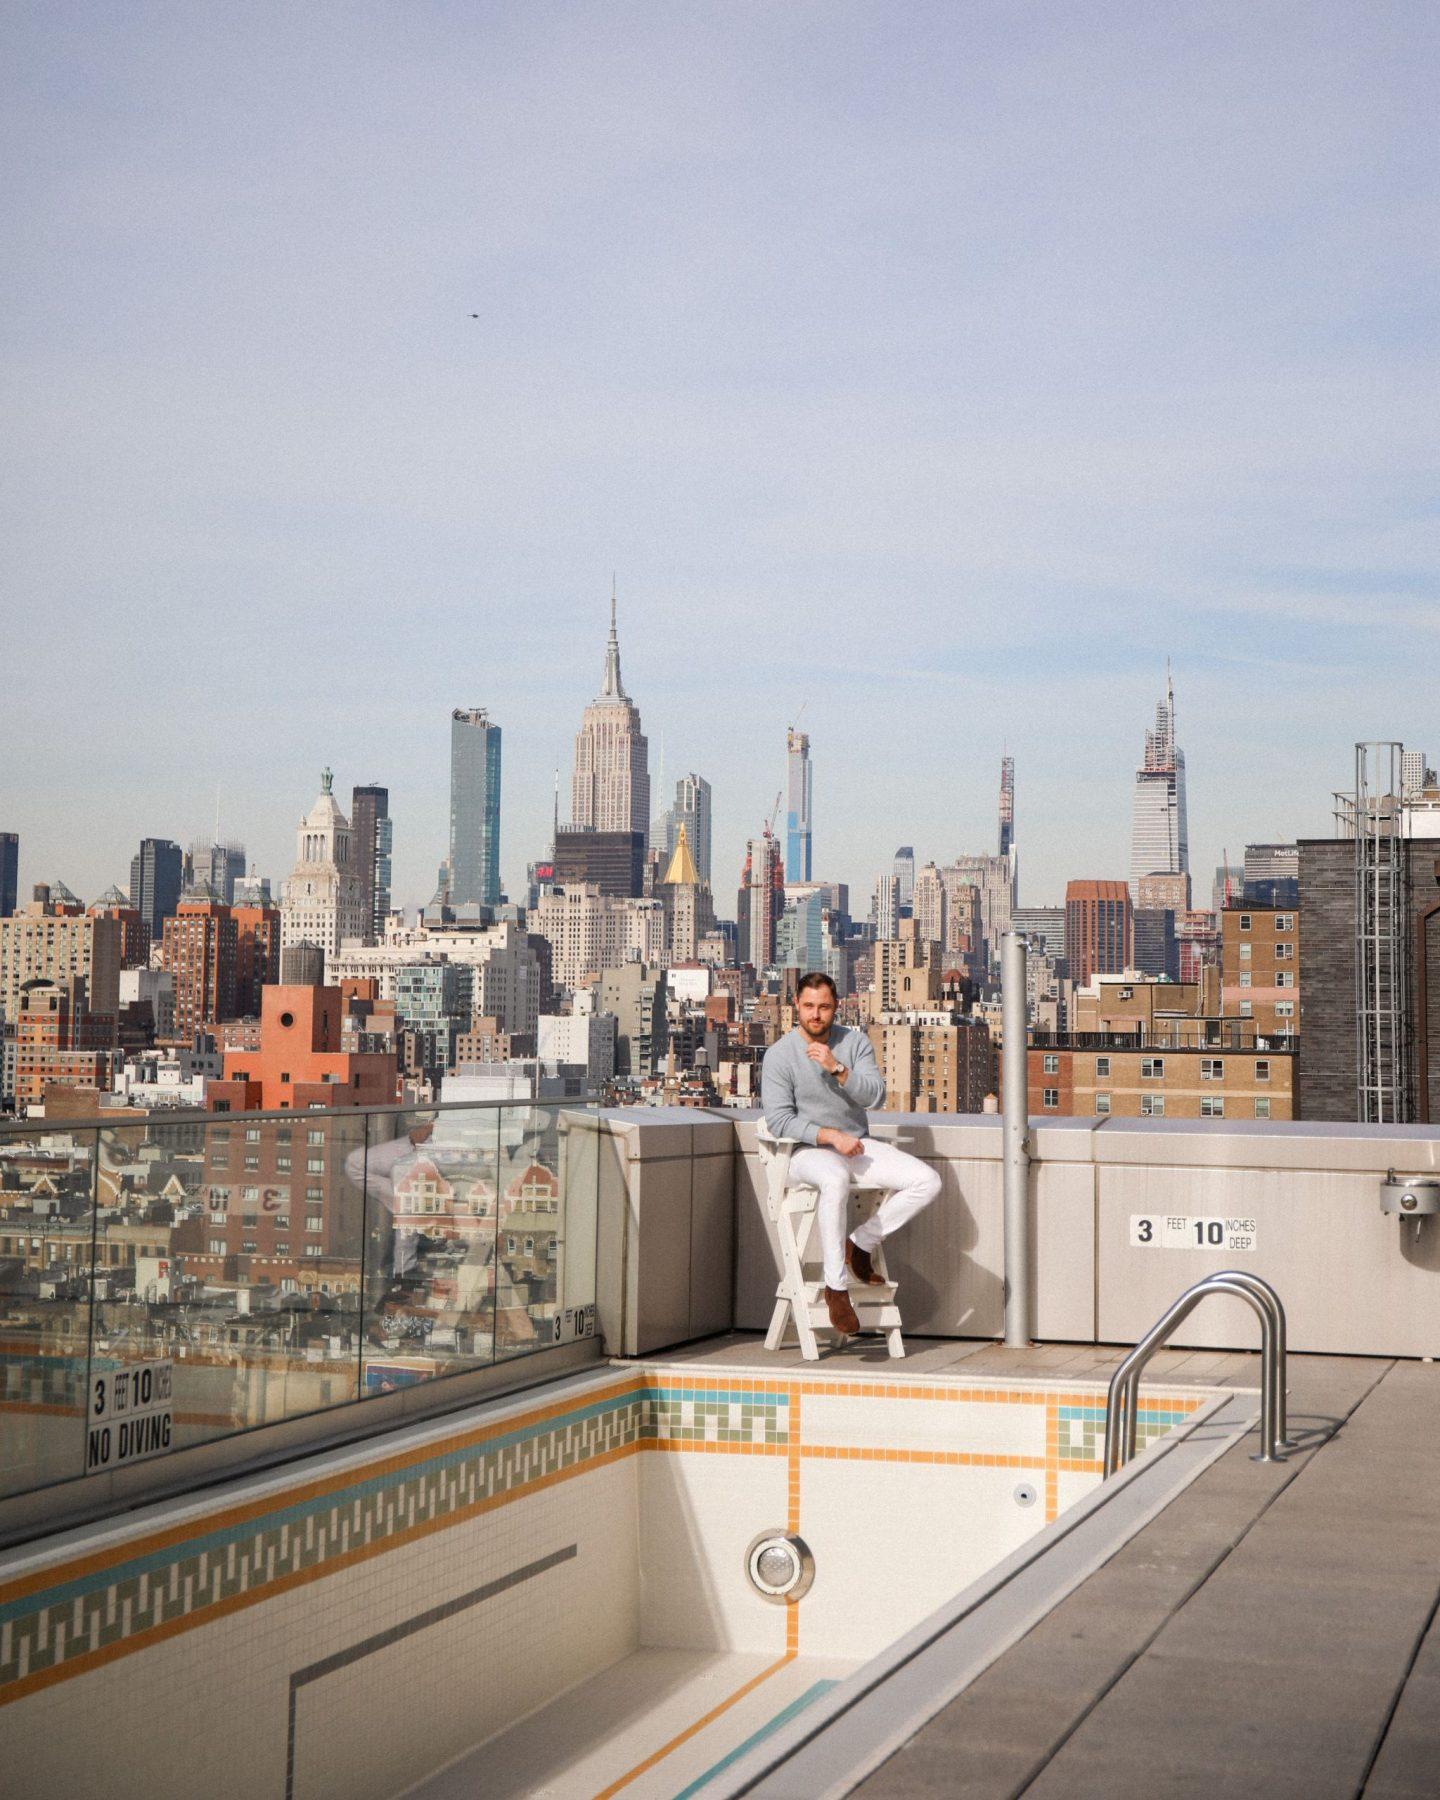 Mr. Purple, New York, Katie Heath, KALANCHOE